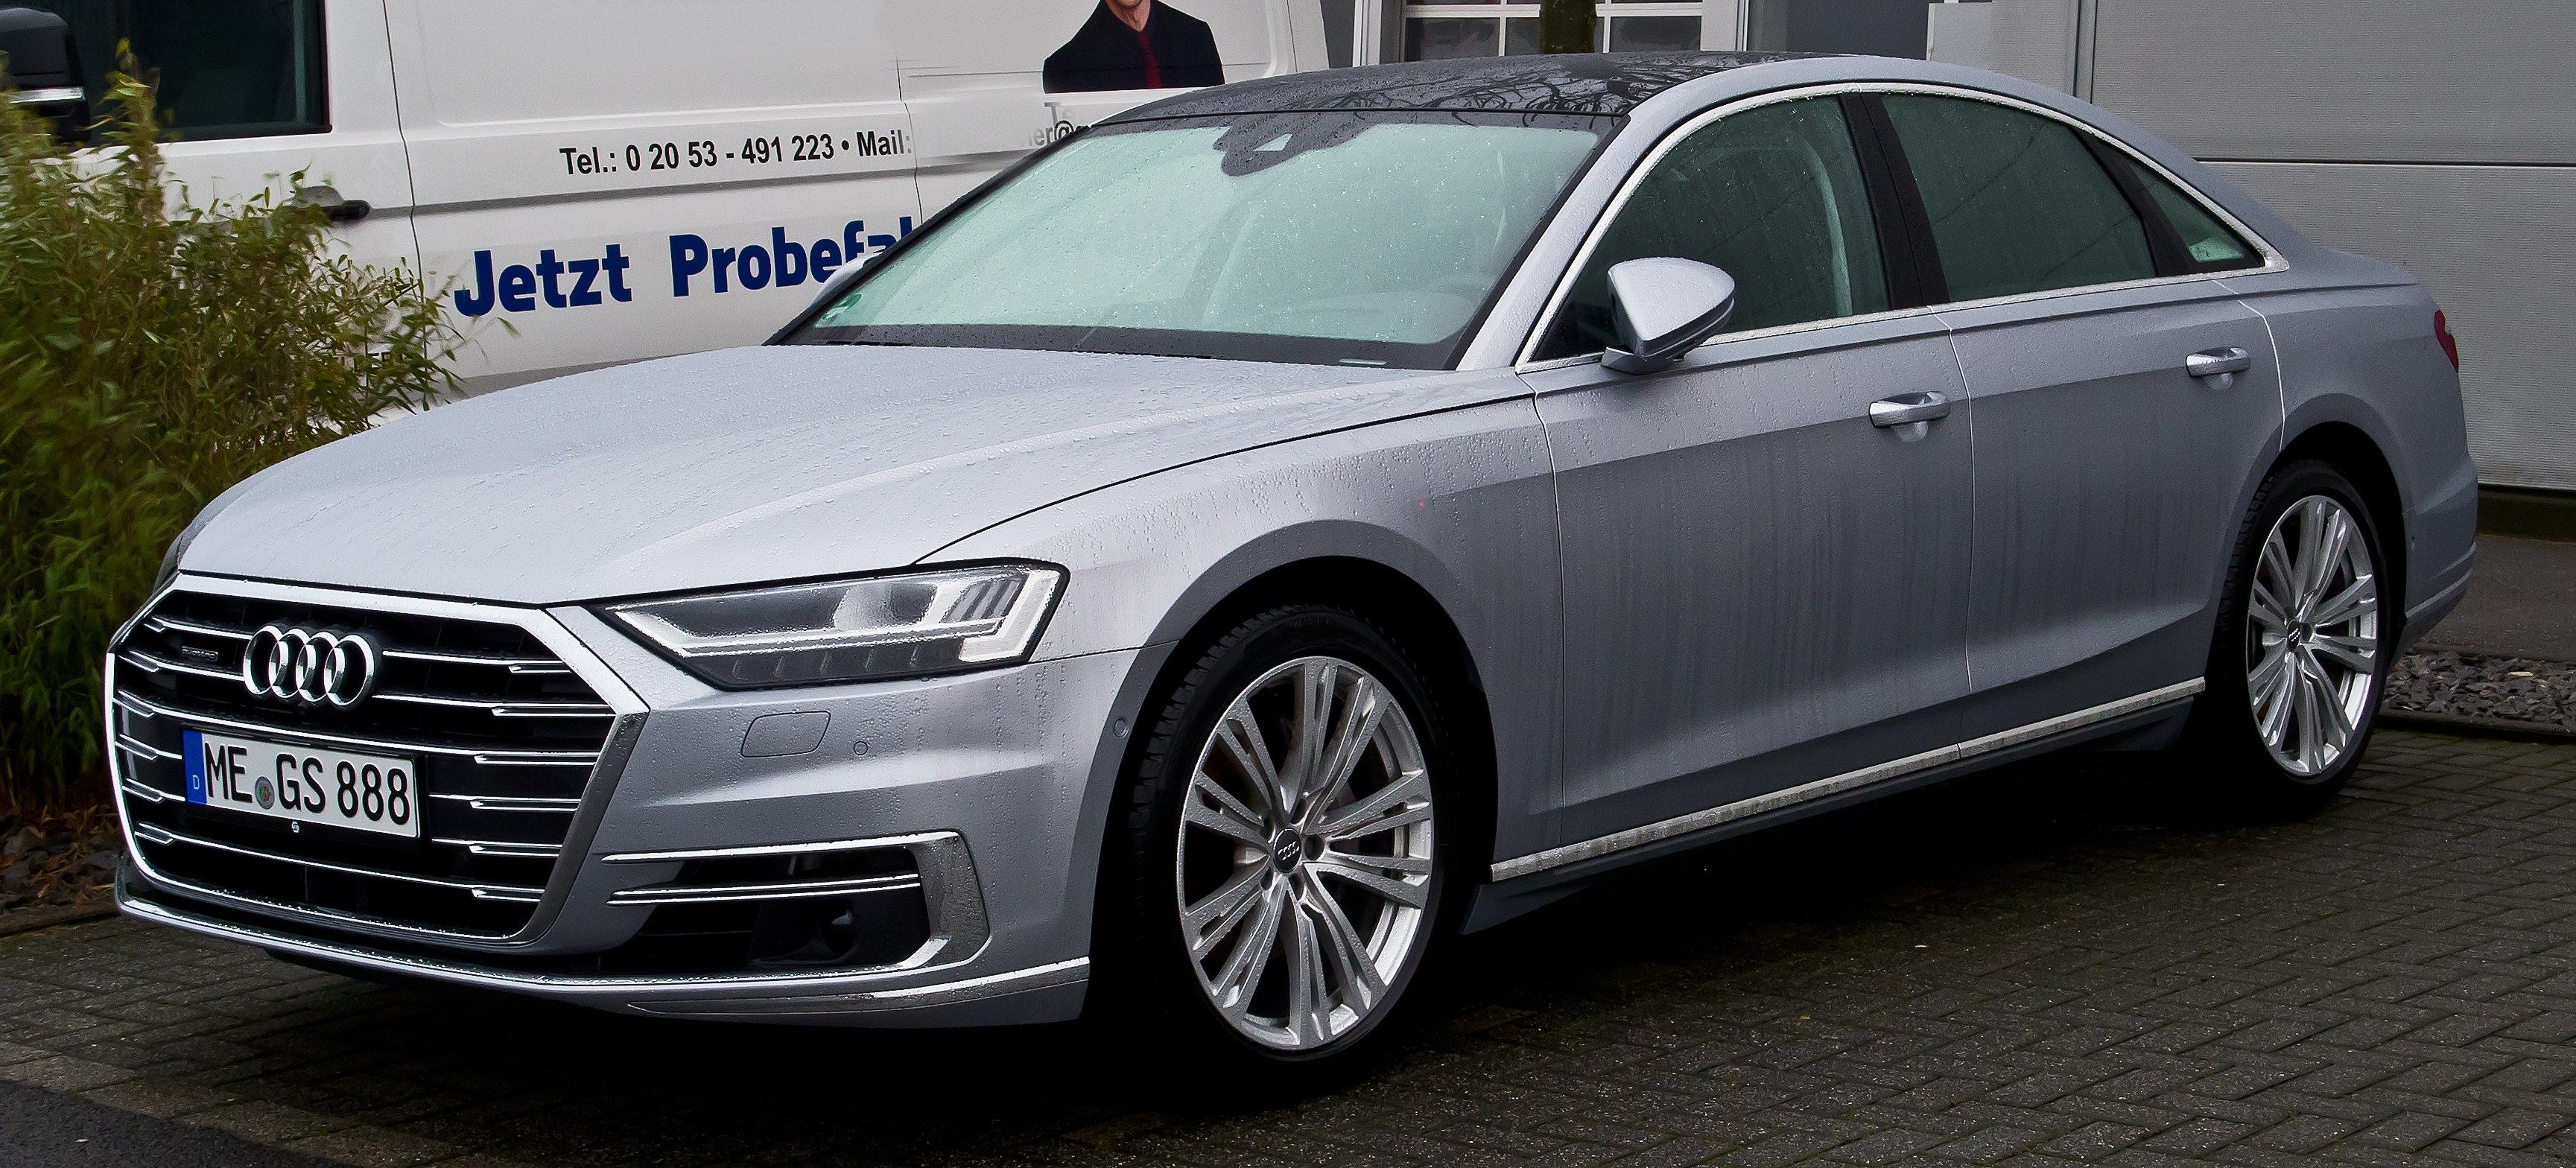 New Audi S4 2020 Picture Audi a8, Audi s5, Audi